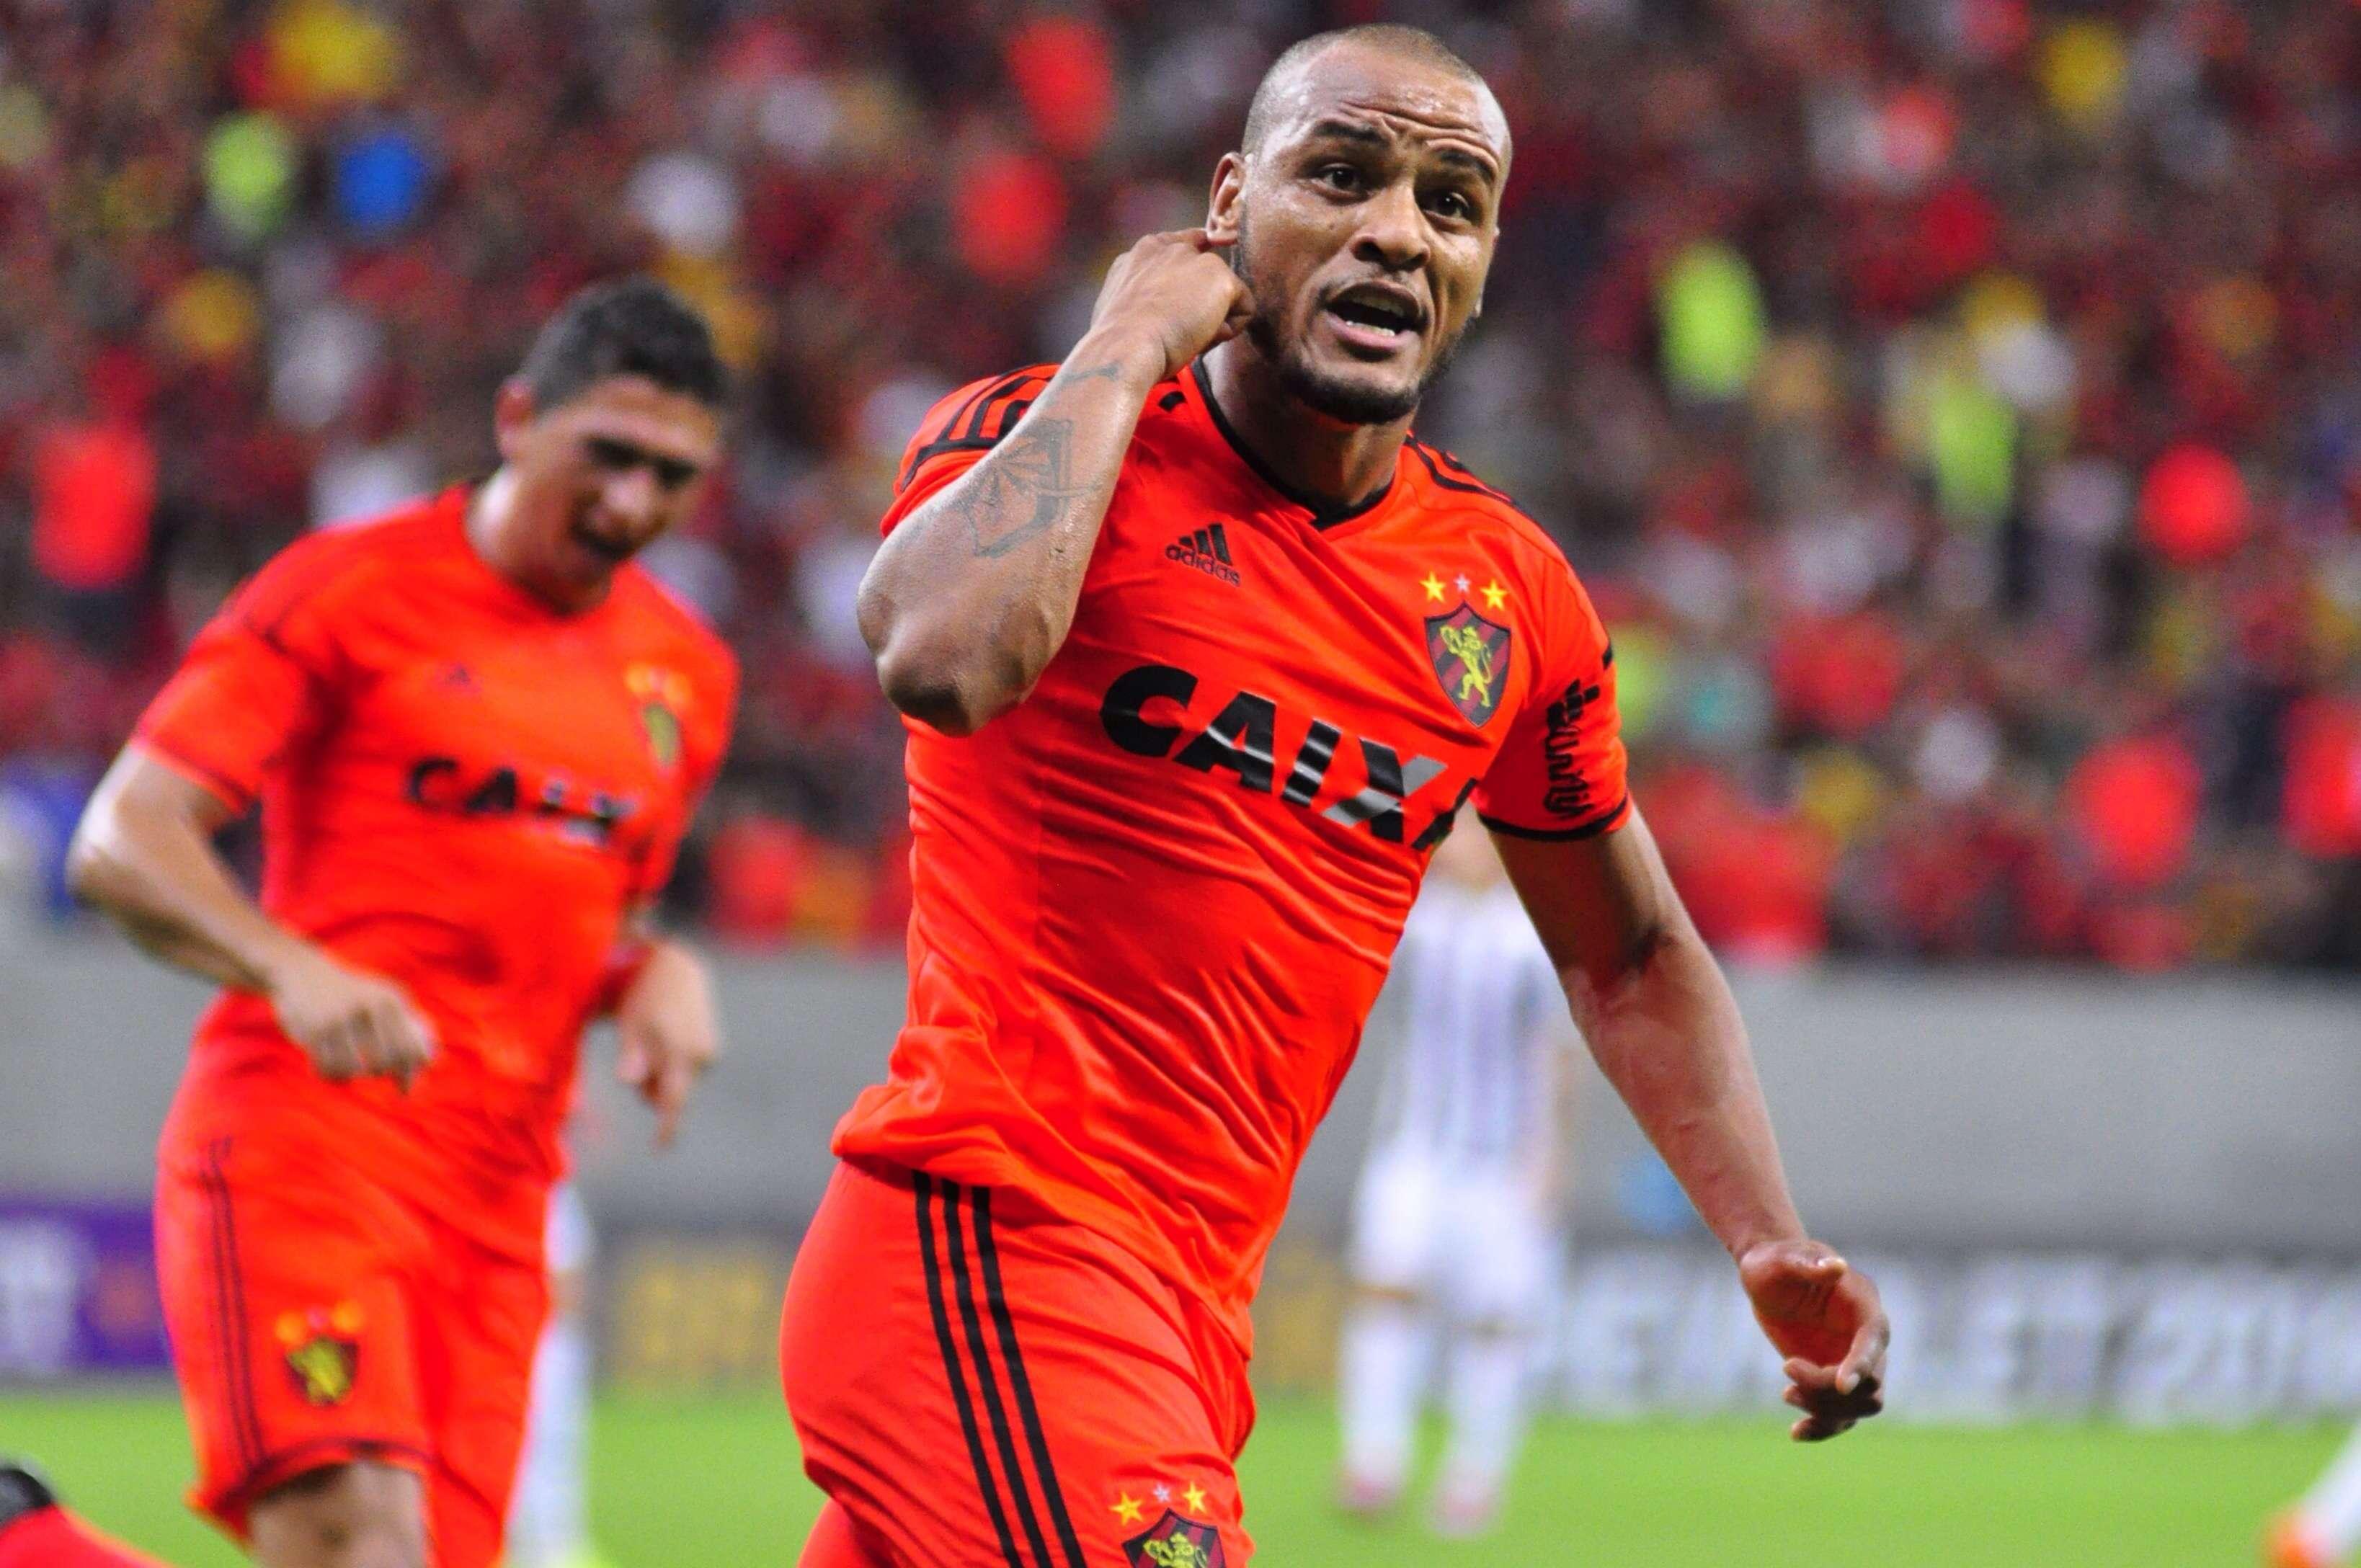 Patric fez três gols na partida Foto: Anderson Stevens / Agência Eleven/Gazeta Press